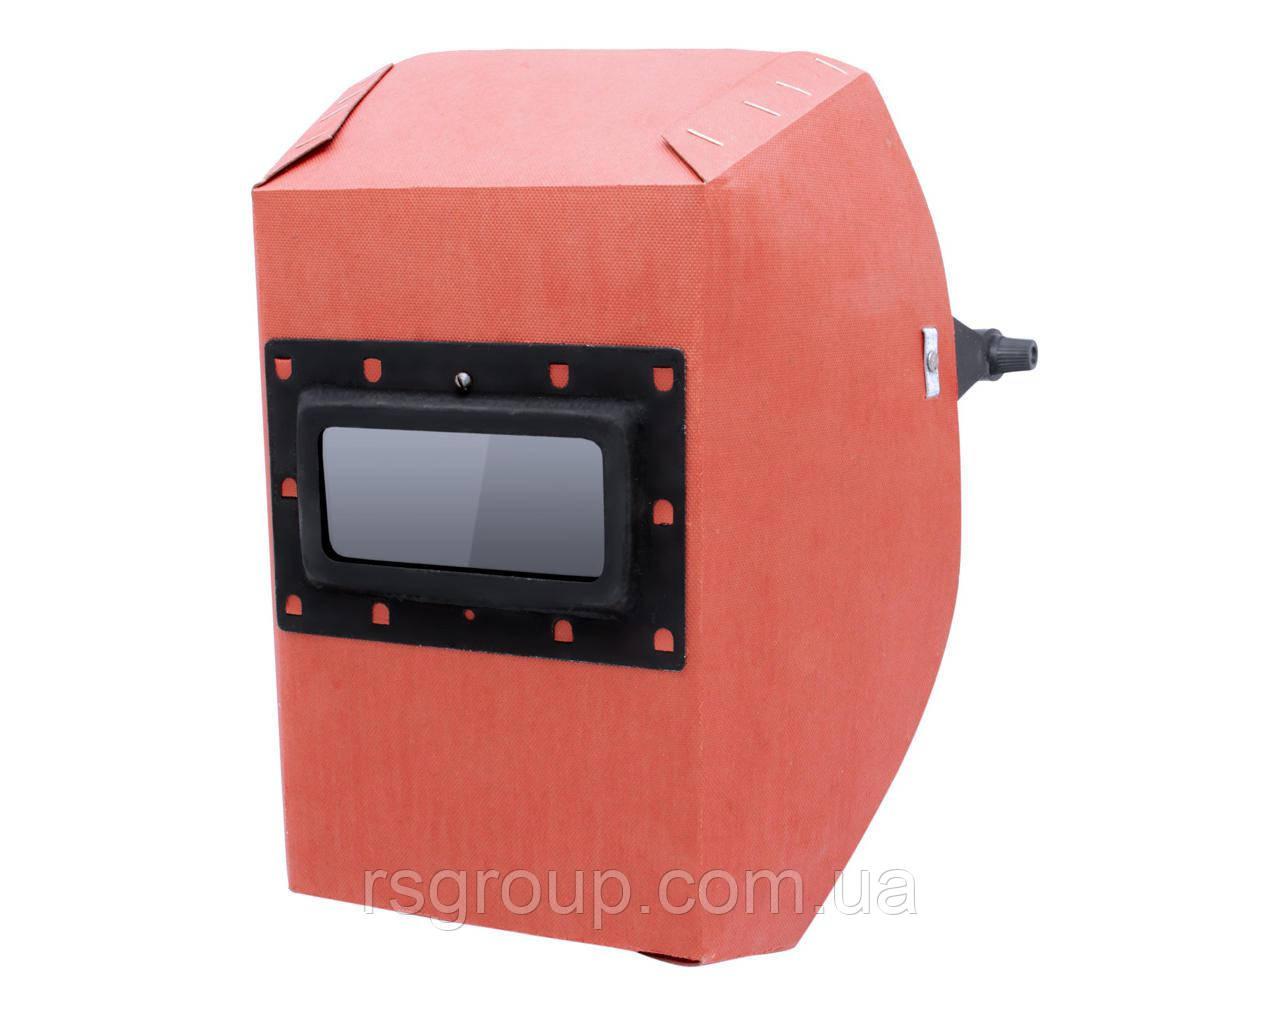 Маска сварщика фибра-картон 0,8 мм VITA красный